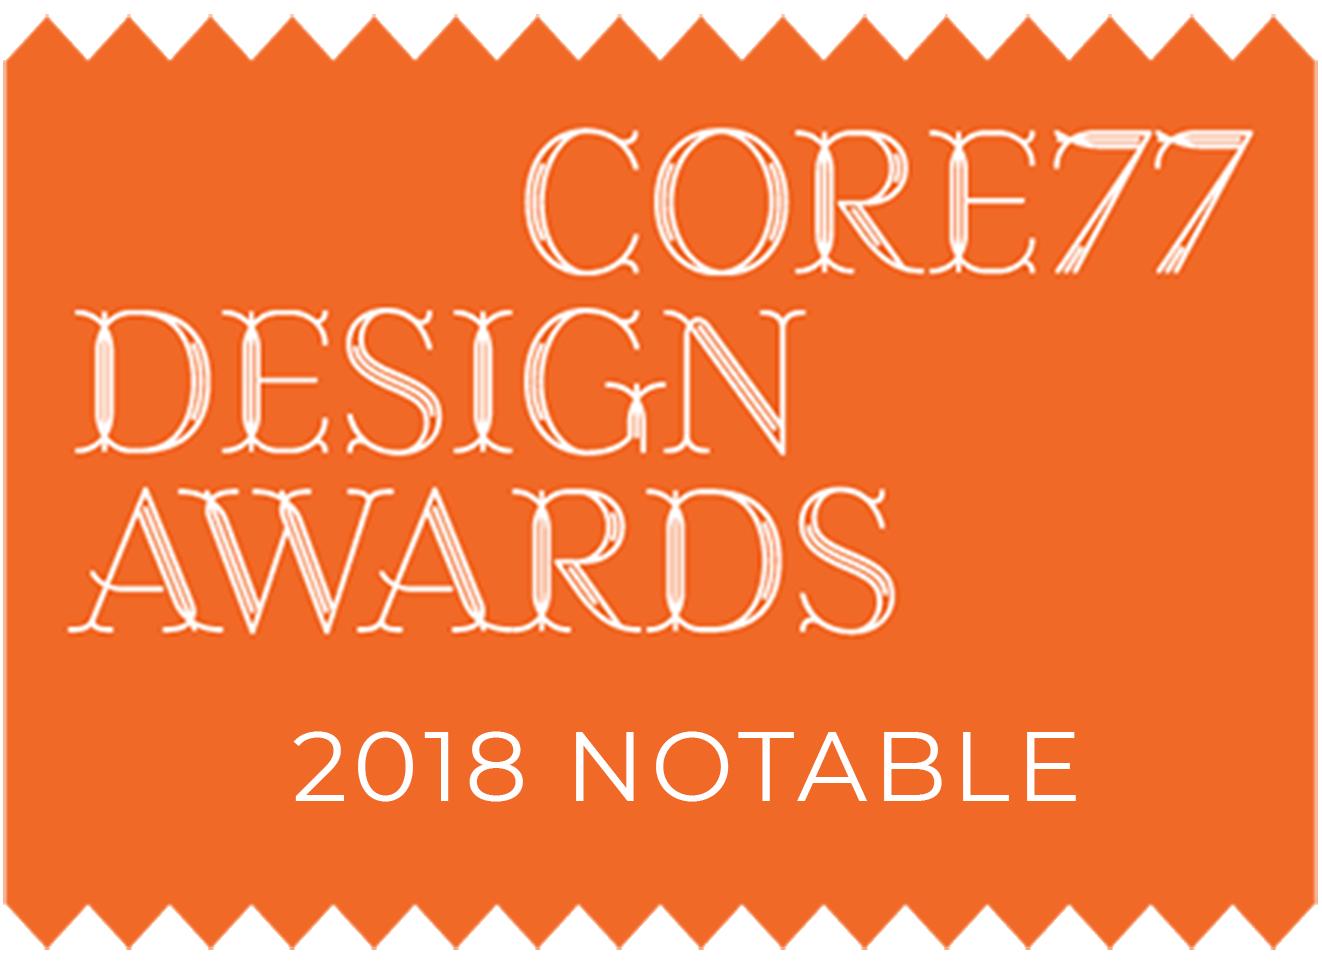 Core77 2018 Notable